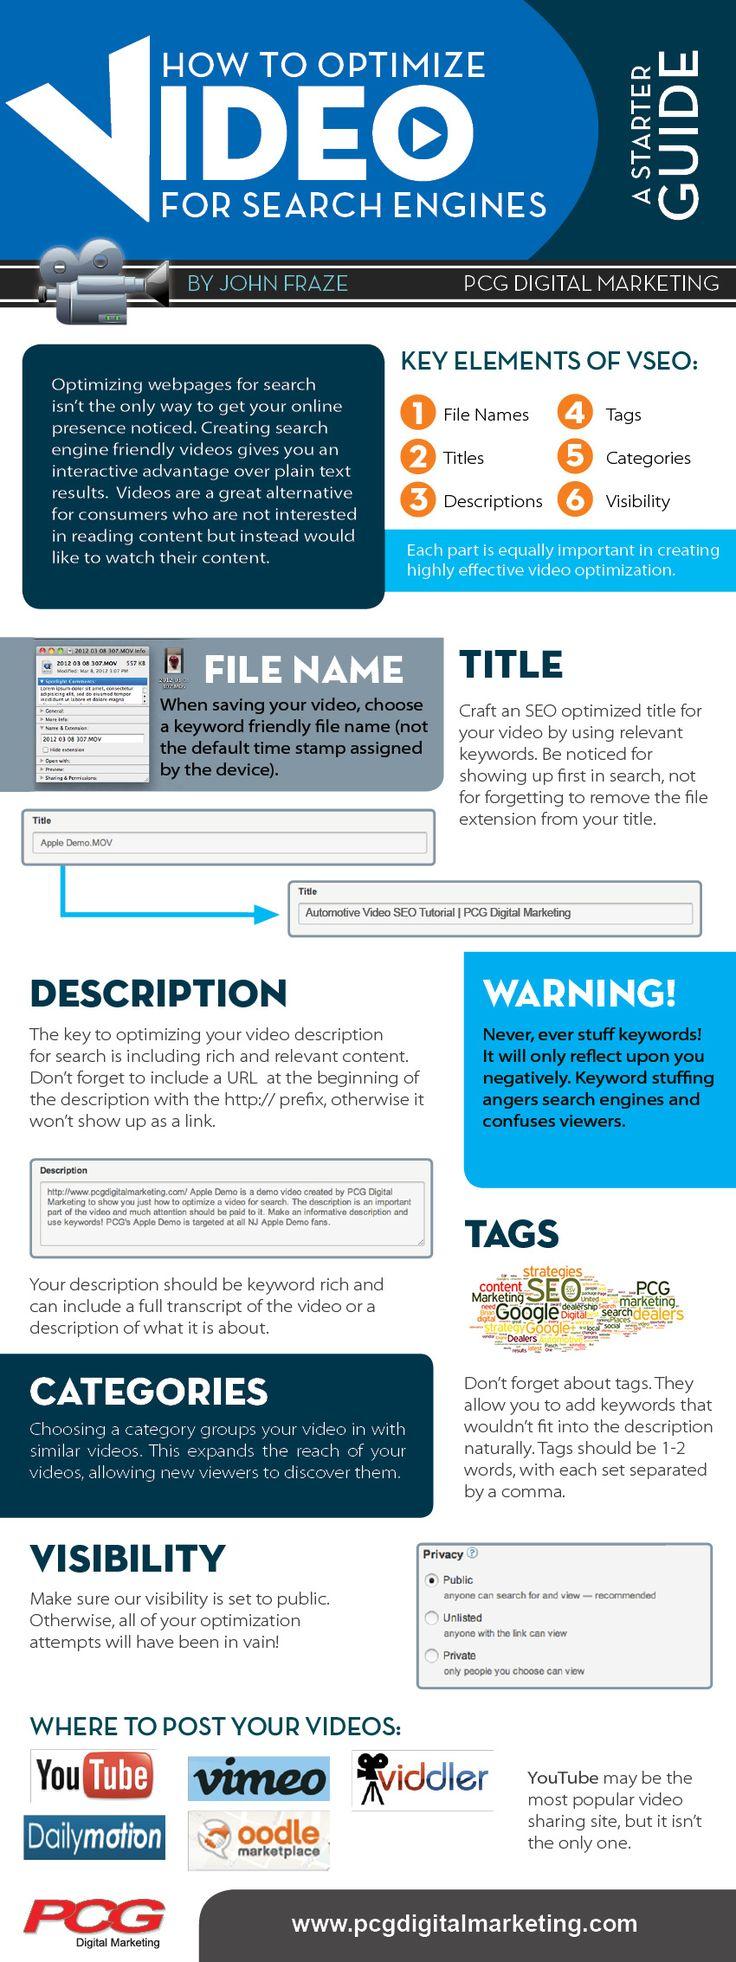 Infographic: Video Optimization Starter Guide.